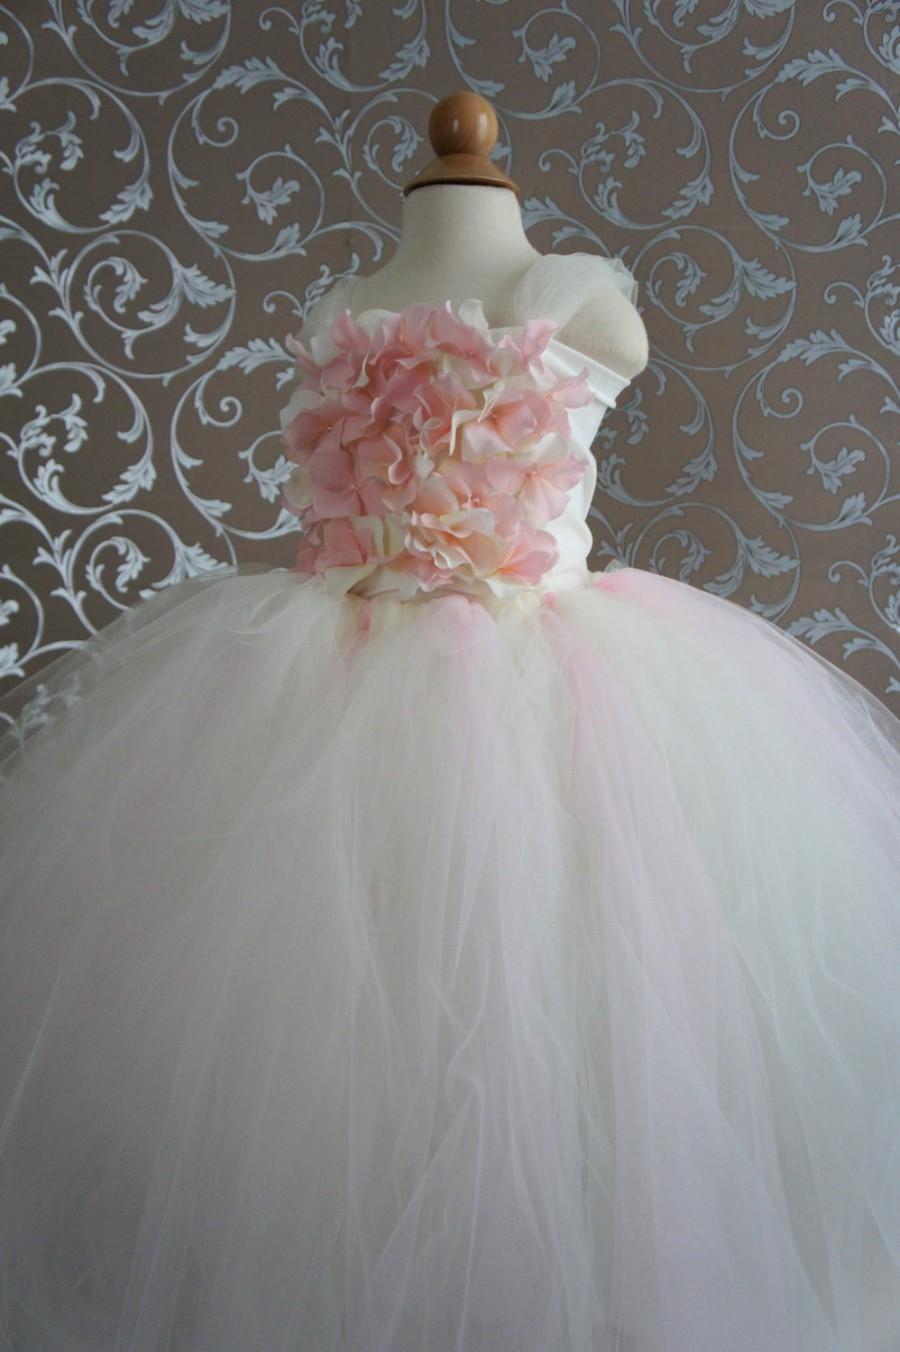 Hochzeit - Flower Girl Dress, Tutu Dress, Girls Dress, Ivory dress, Toddler dress, Baby Photo Prop, in Blush Pink and Ivory, Flower Top, Tutu Dress